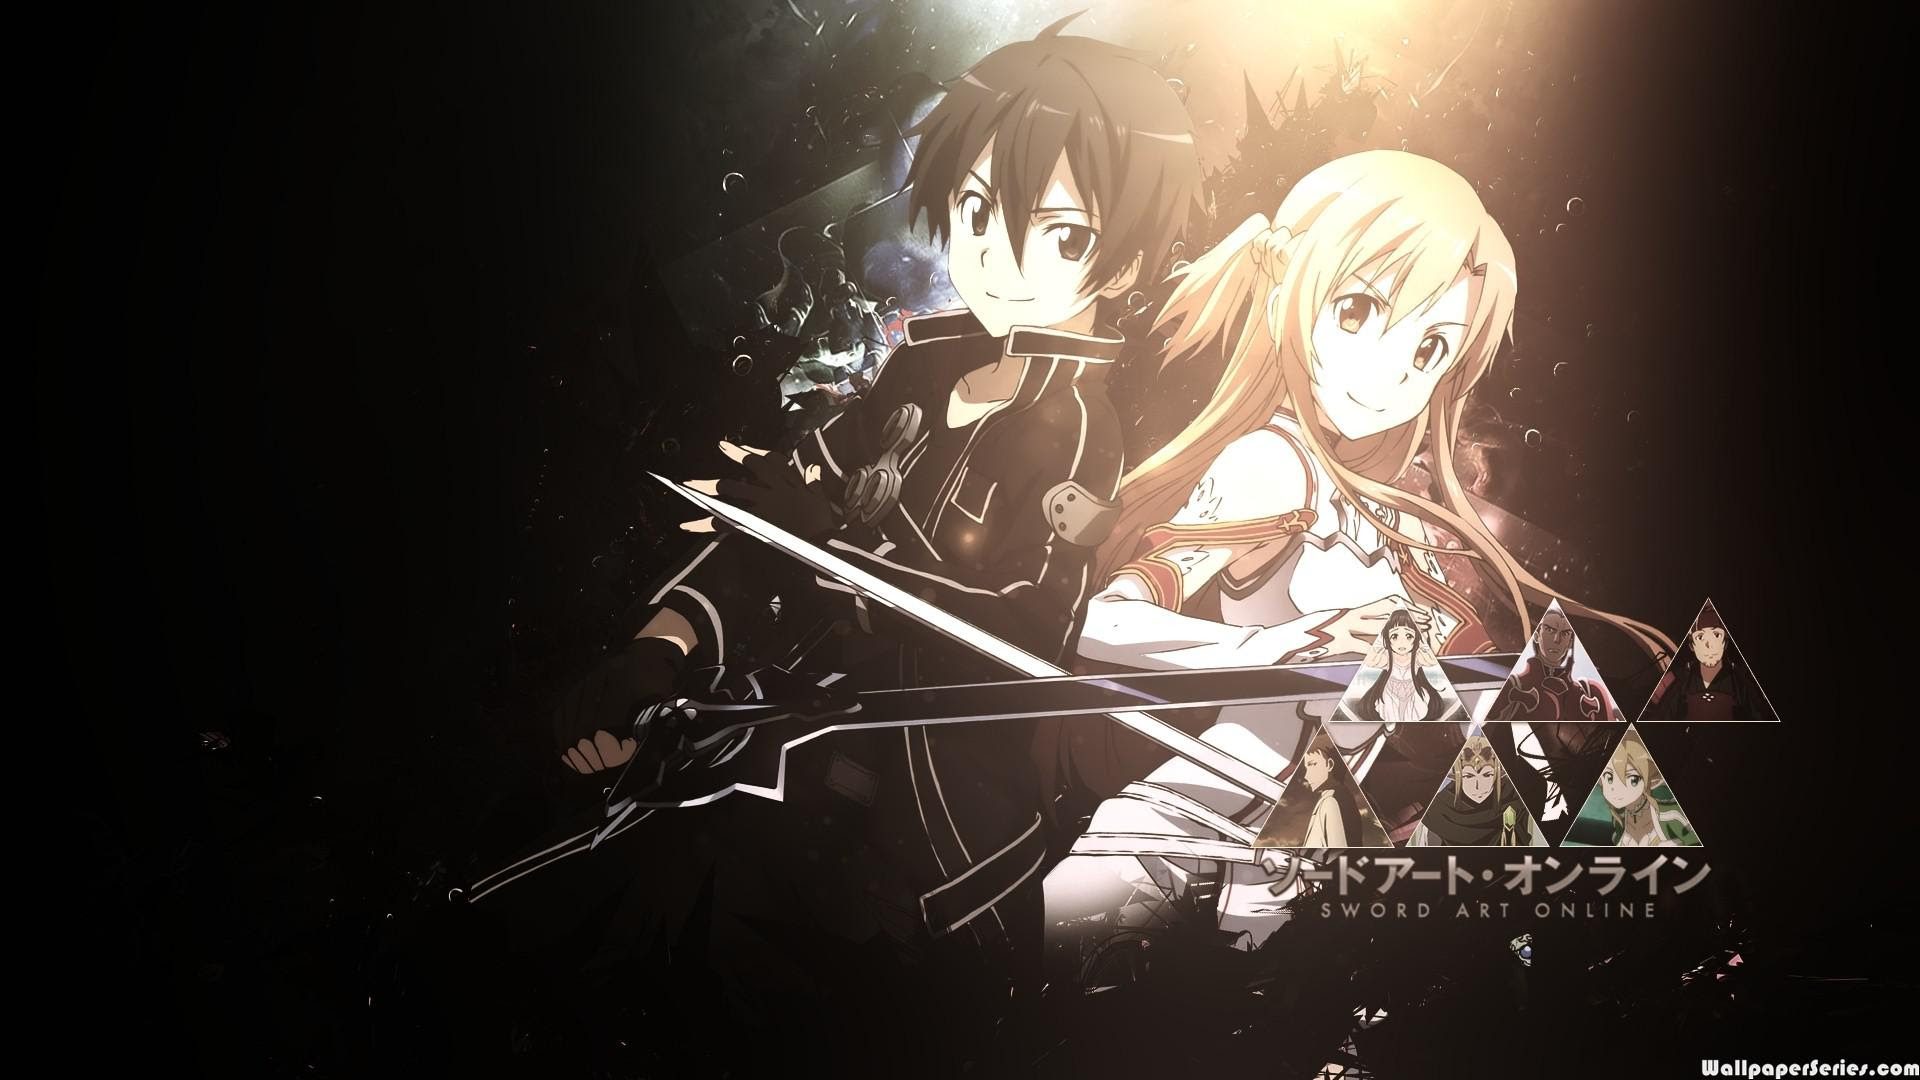 Hd Sword Art Online Anime Kirito And Asuna Wallpaper Download